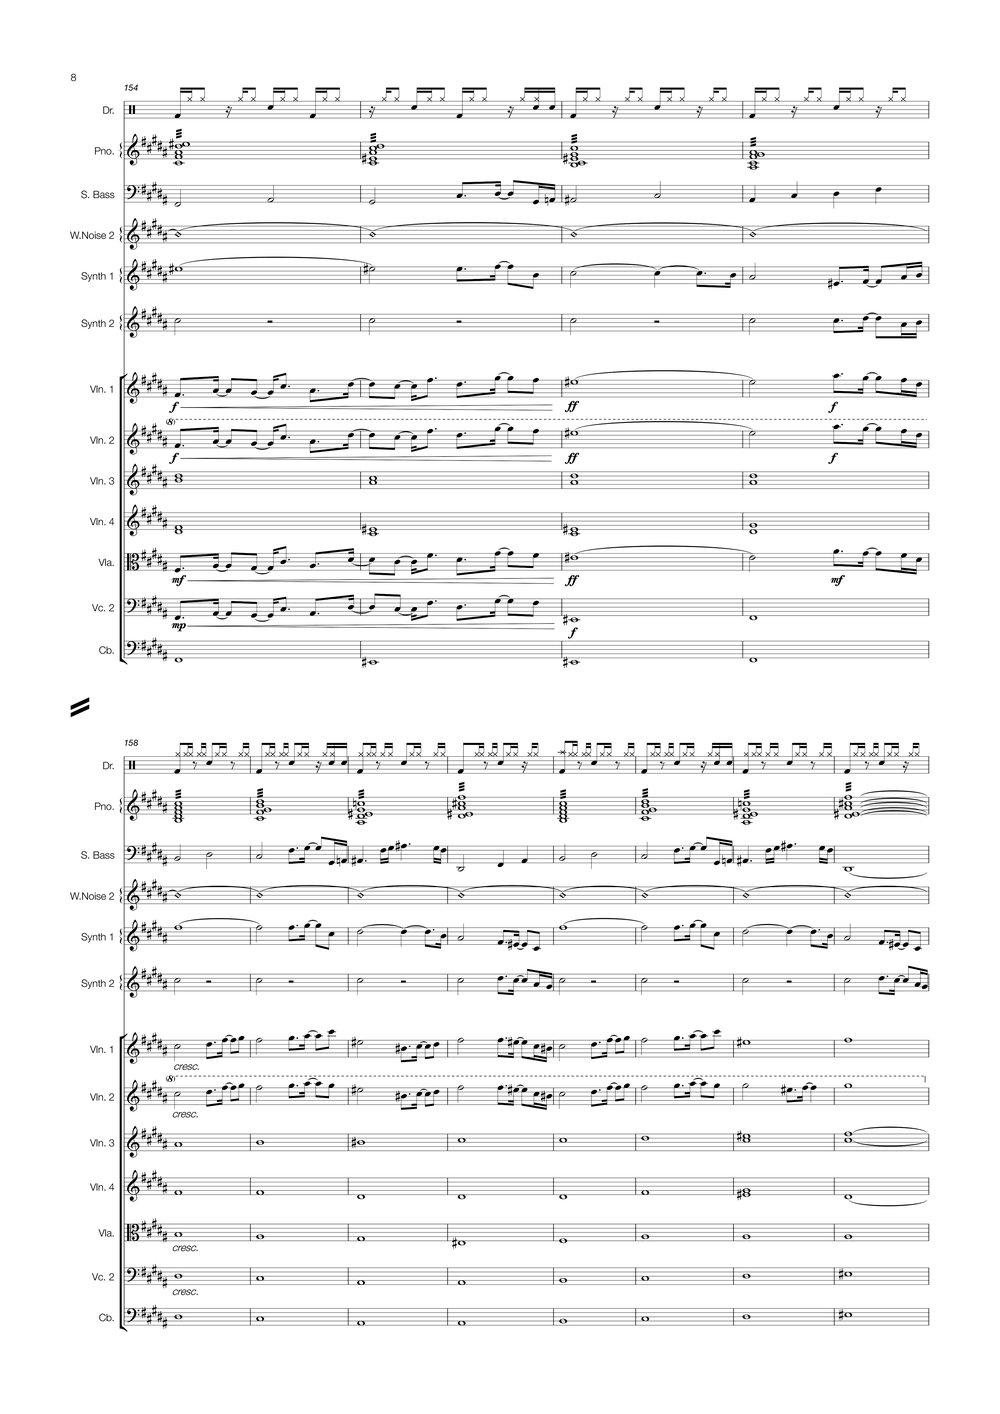 Elliptically Elliptical Score Page 10.jpg